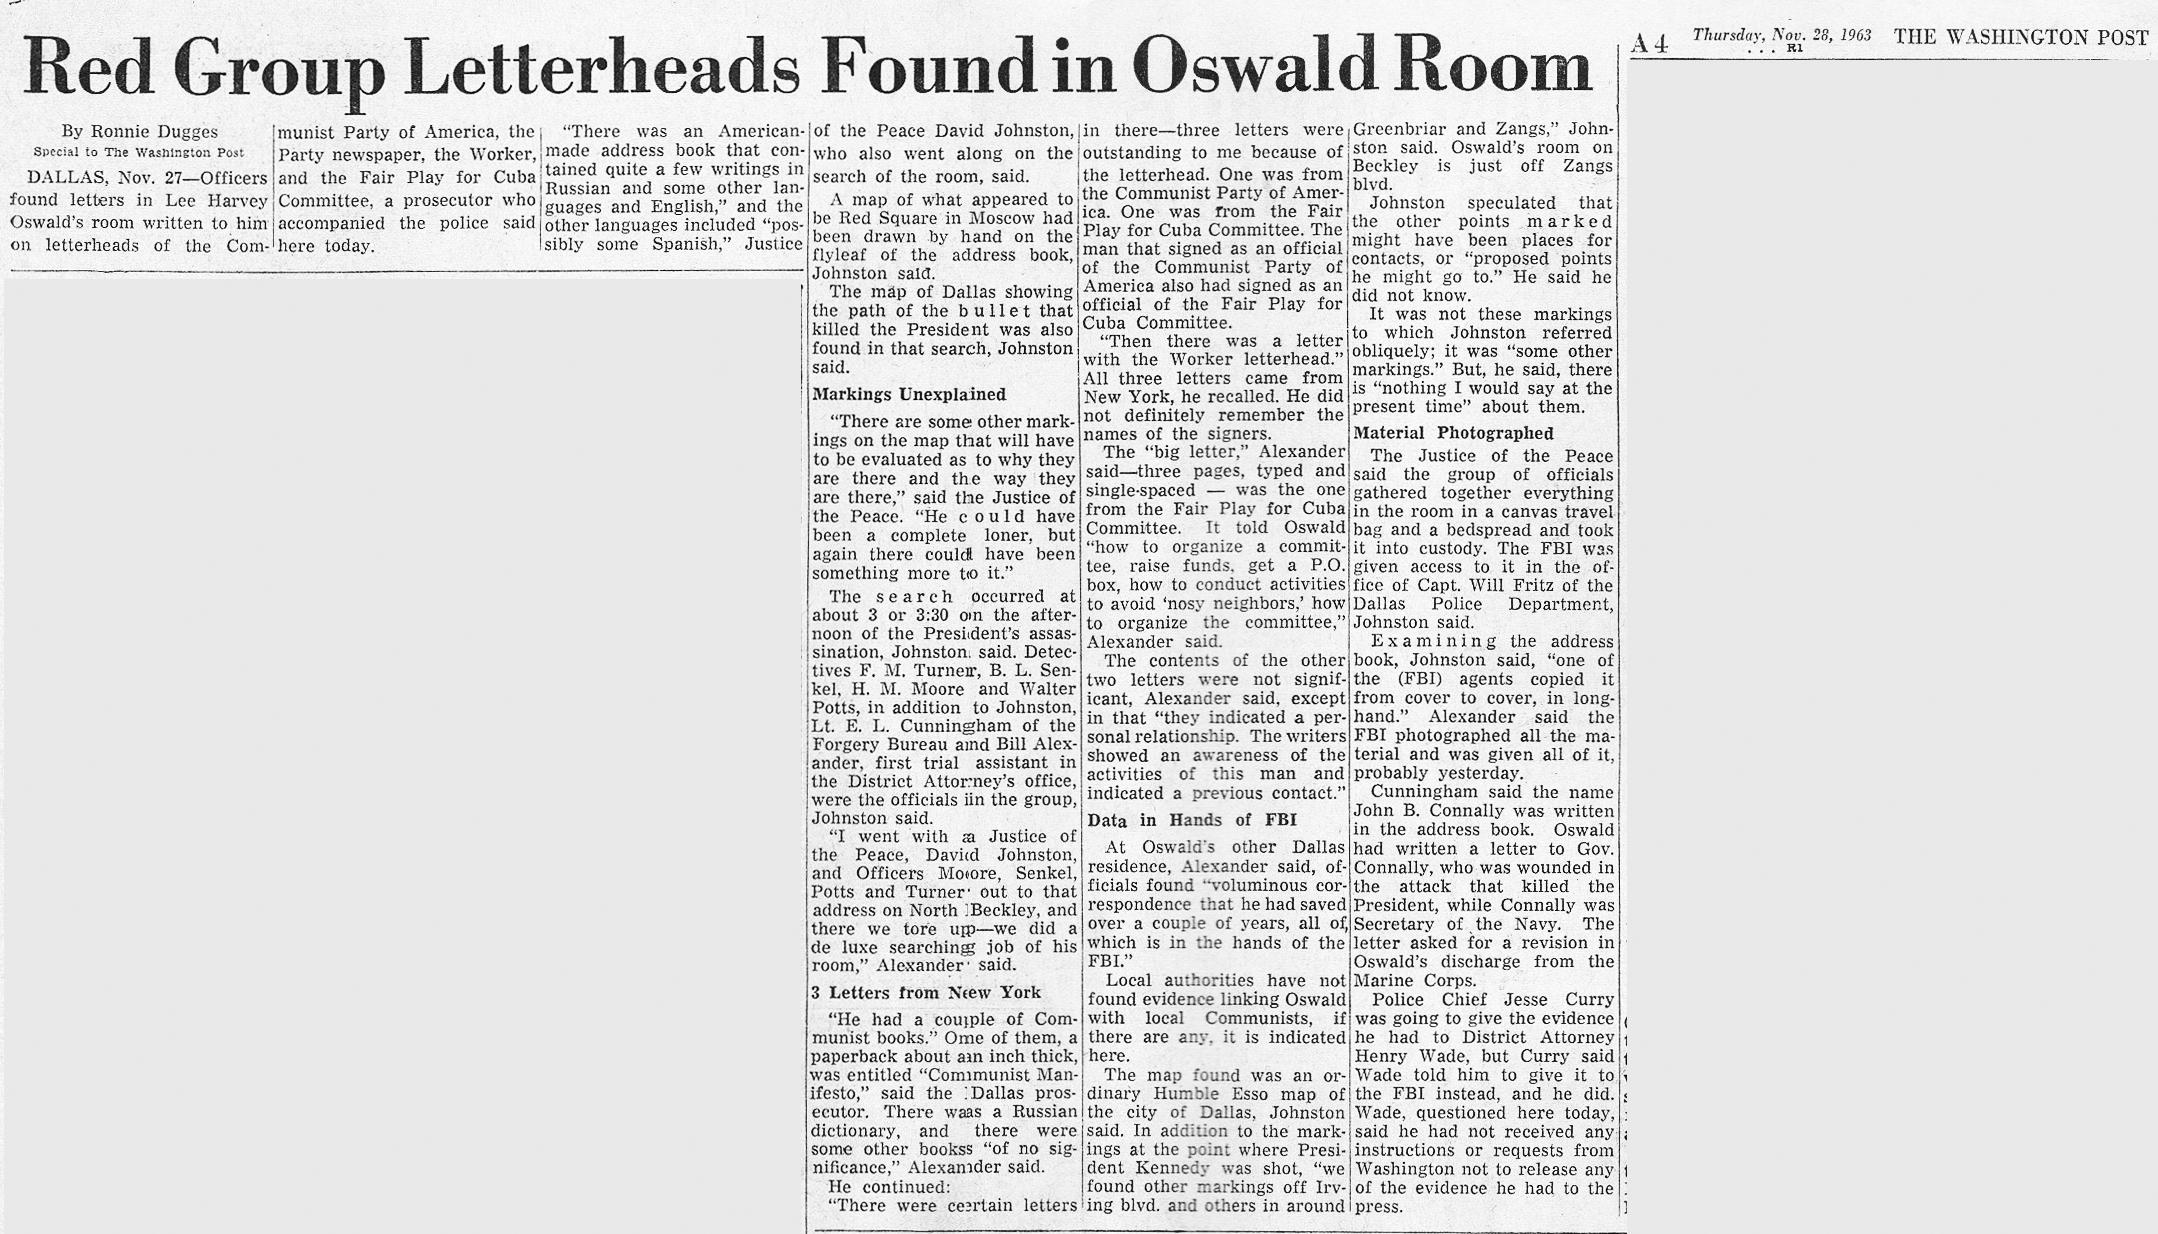 washington-post-nov-28-1963-page-4-rokc-scan